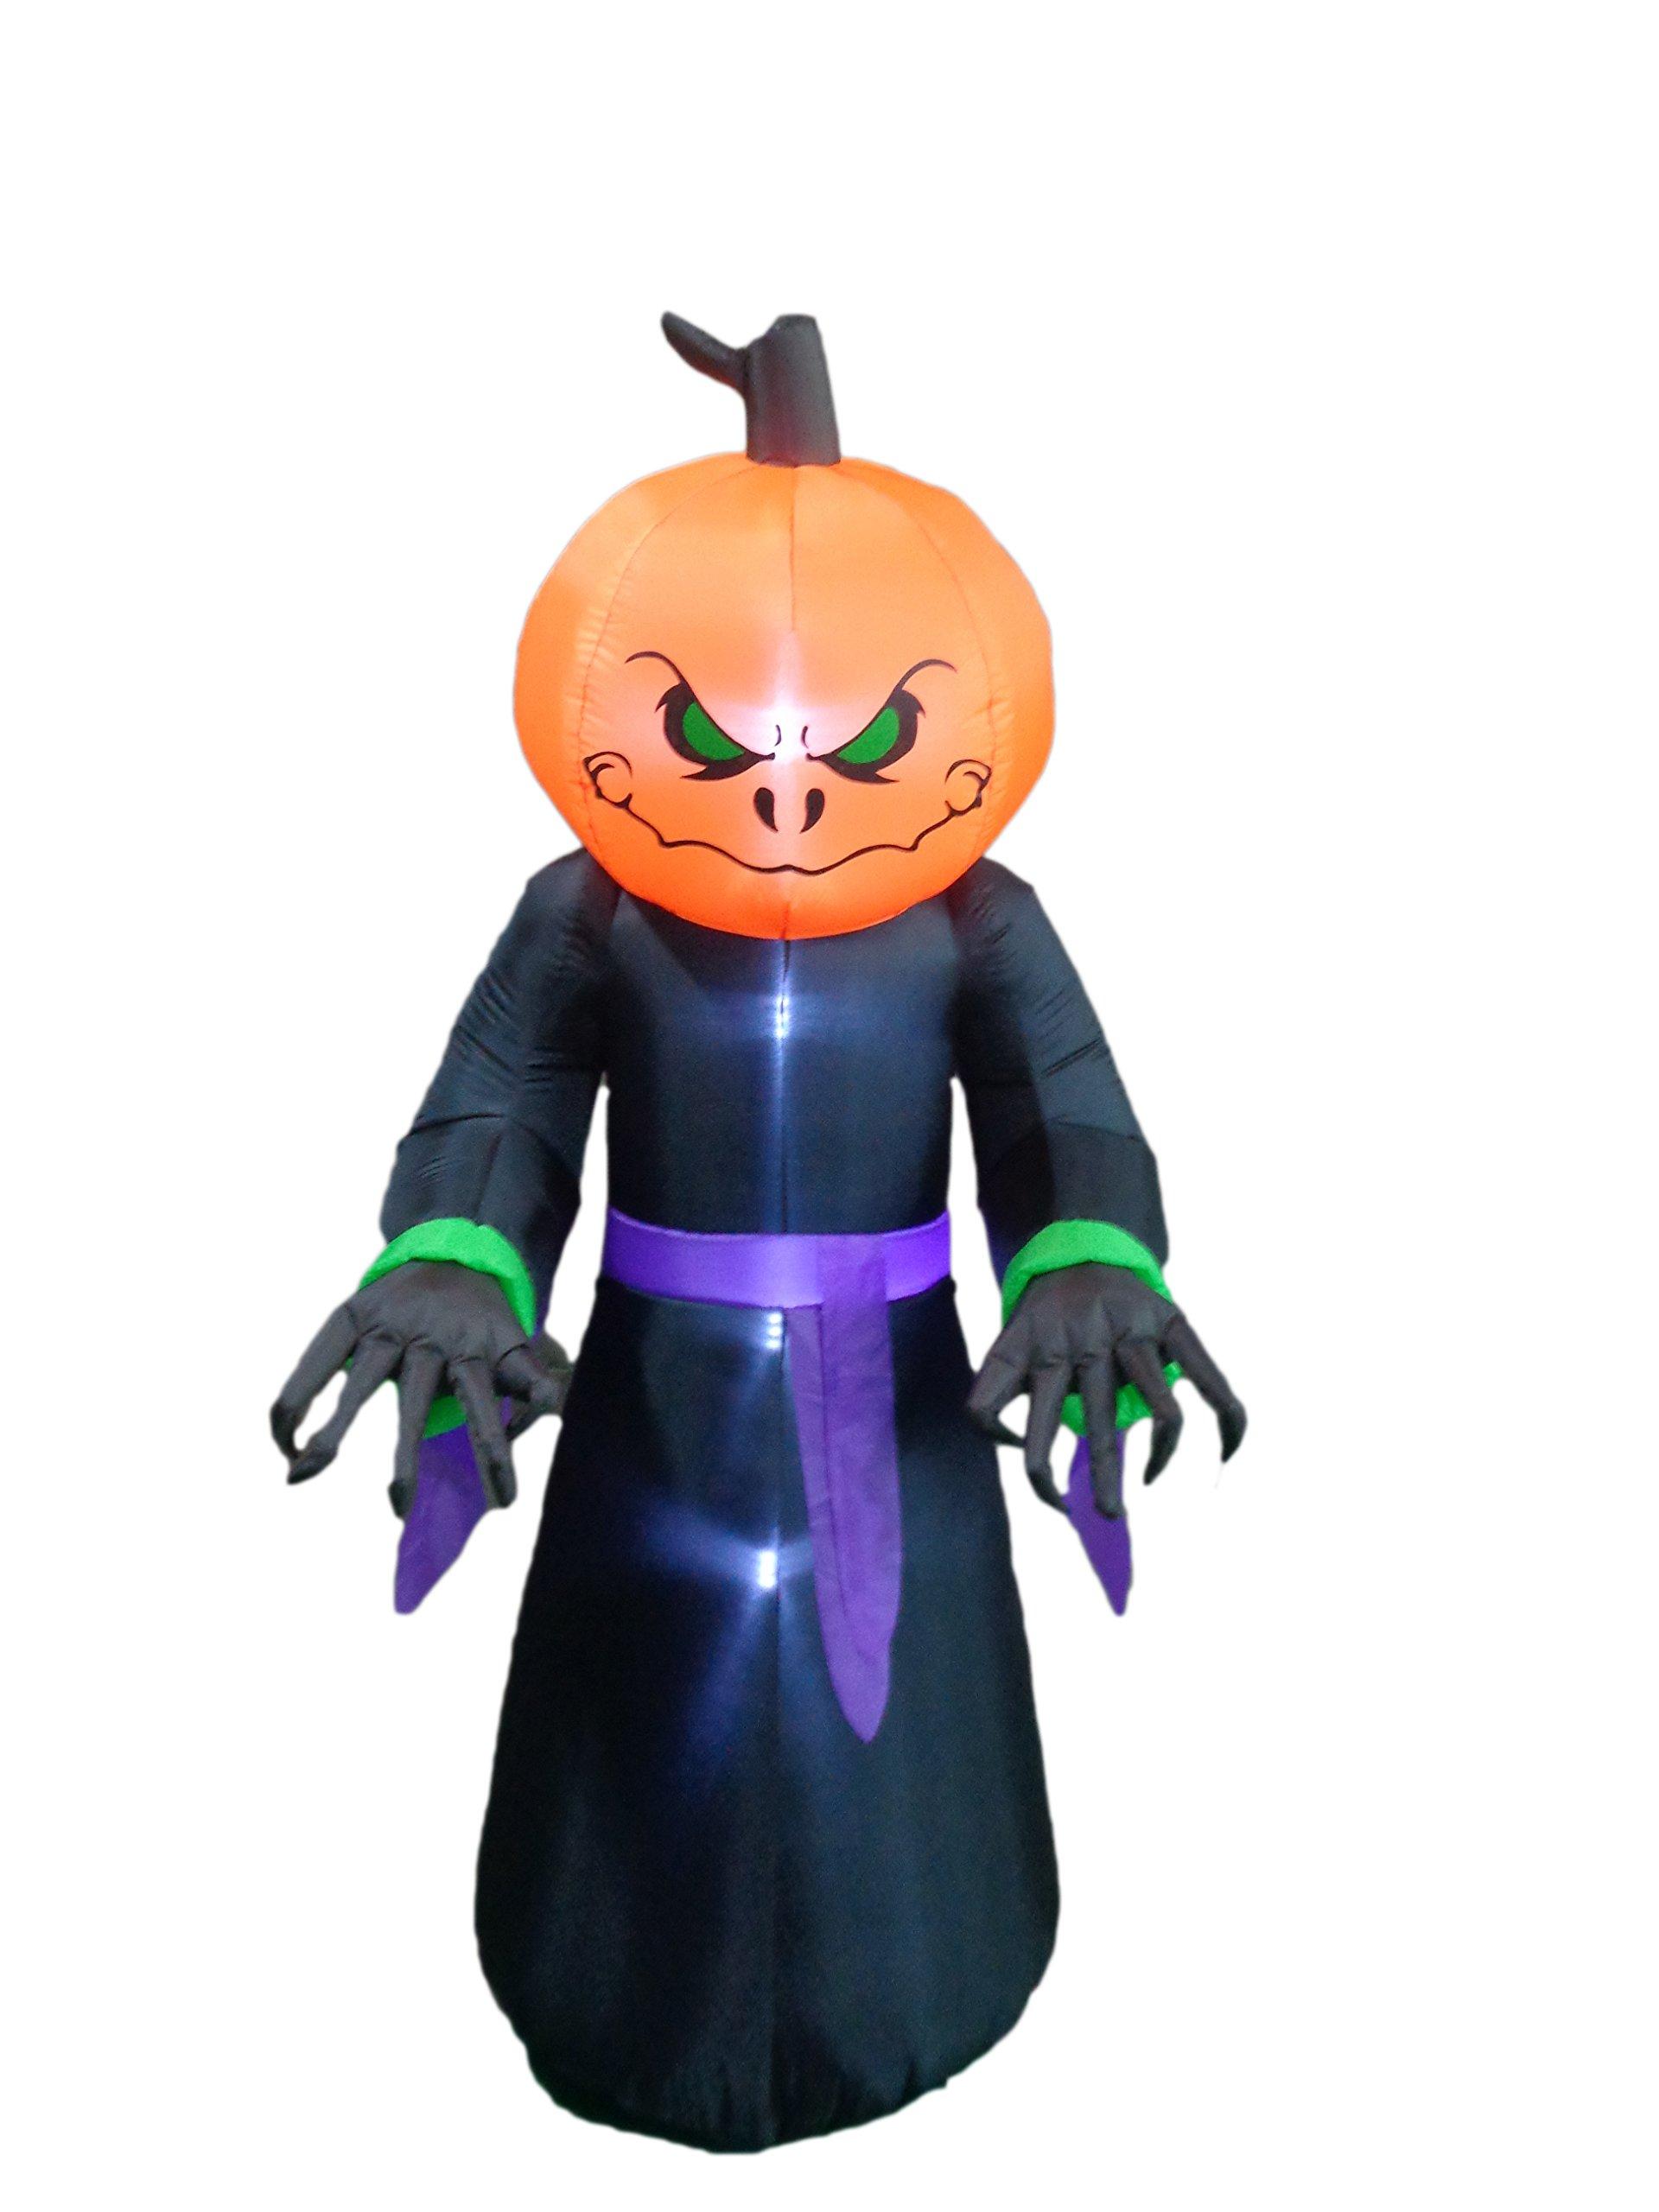 BZB Goods 8 Foot Illuminated Halloween Inflatable Pumpkin Overlord Decoration